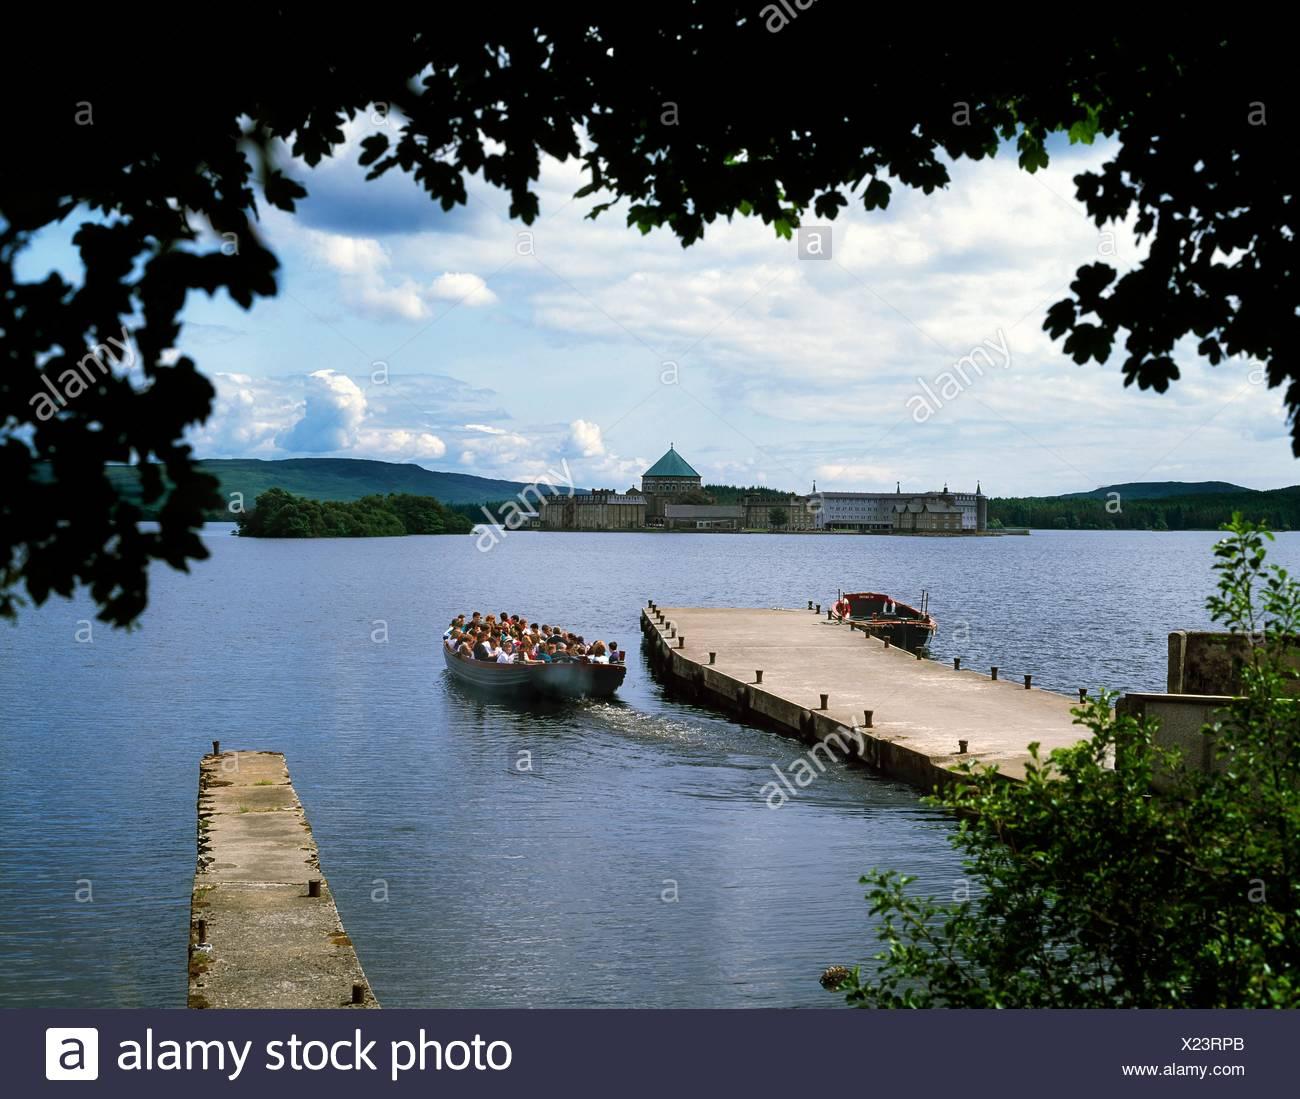 Pilgrims Departing For Lough Derg (Site Of Pilgrimage), Co Donegal, Ireland - Stock Image